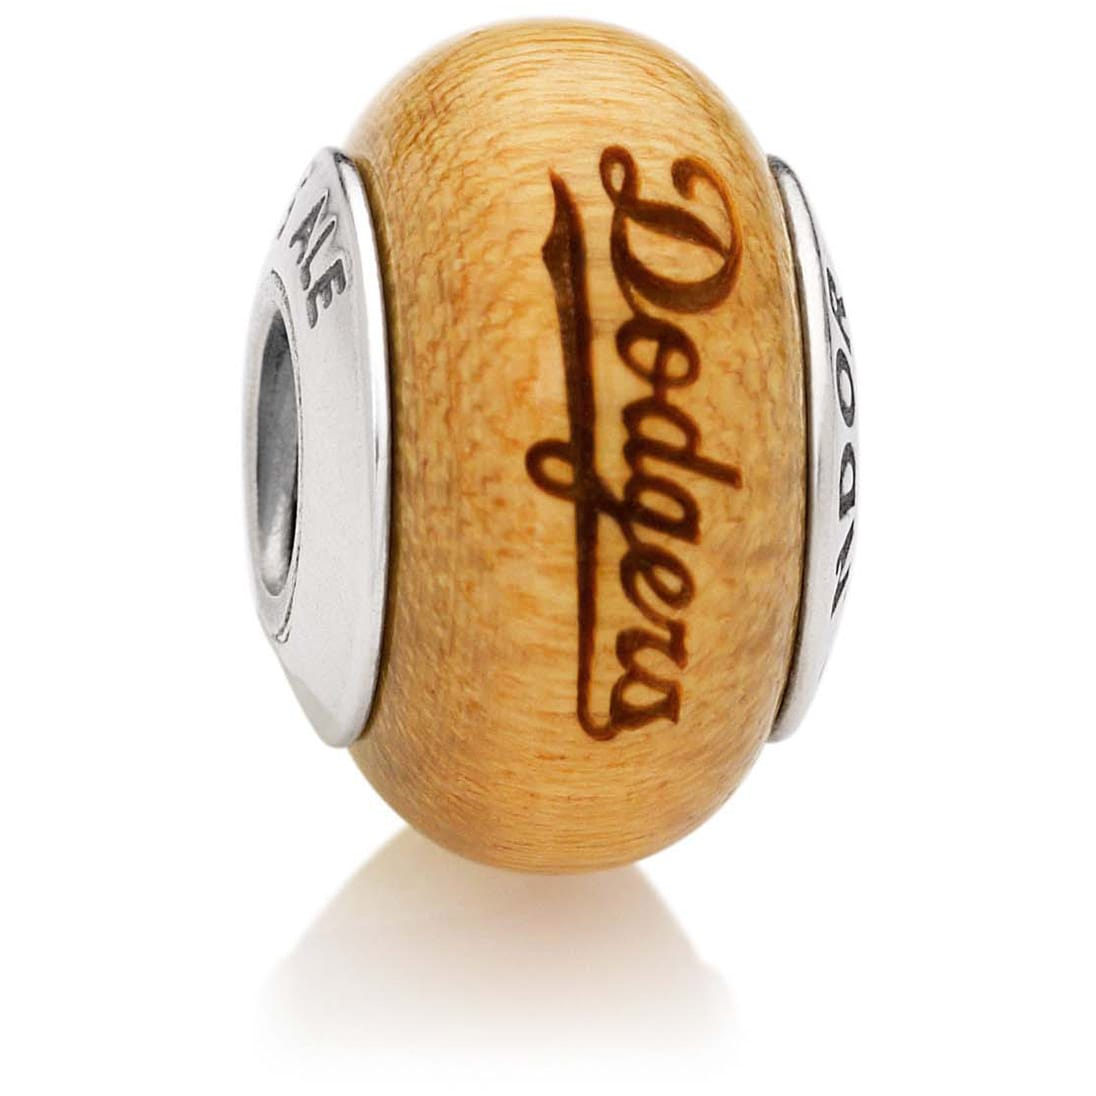 Los Angeles Dodgers Pandora Women's Wood Charm